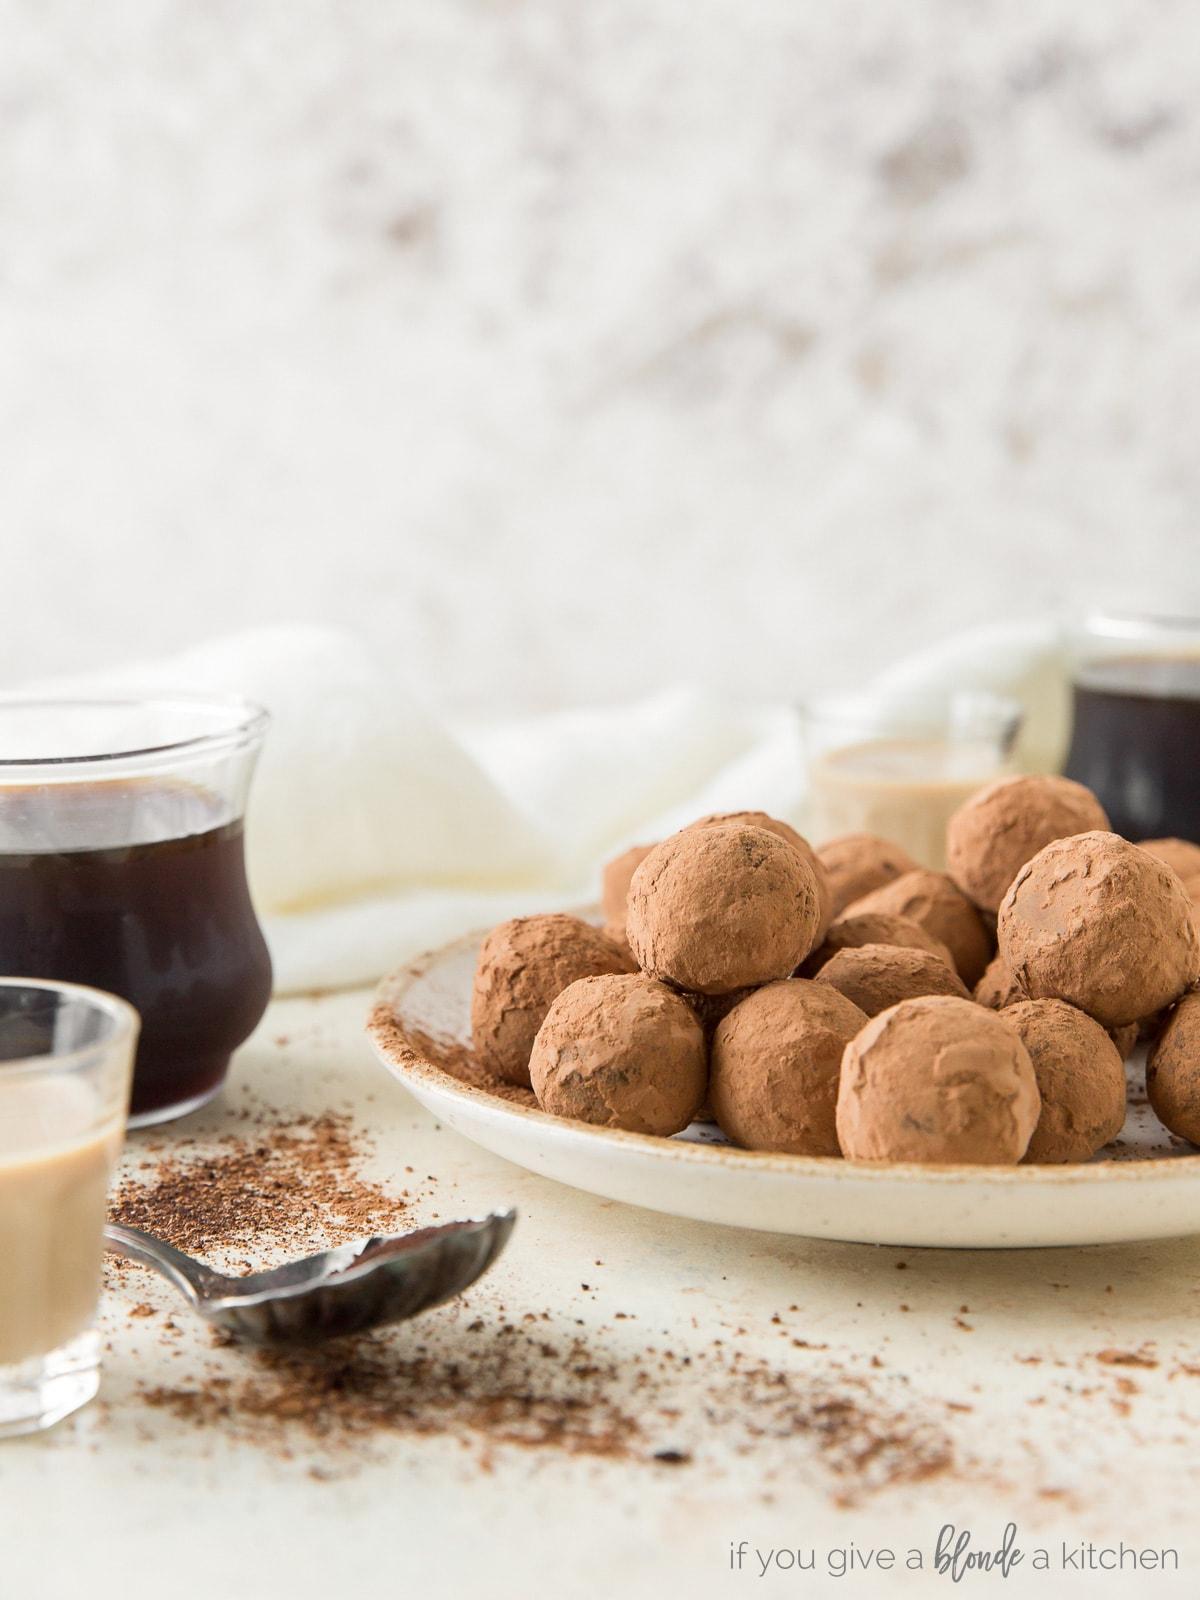 Irish Cream Espresso Truffles for St. Patrick's Day | Recipe by @haleydwilliams